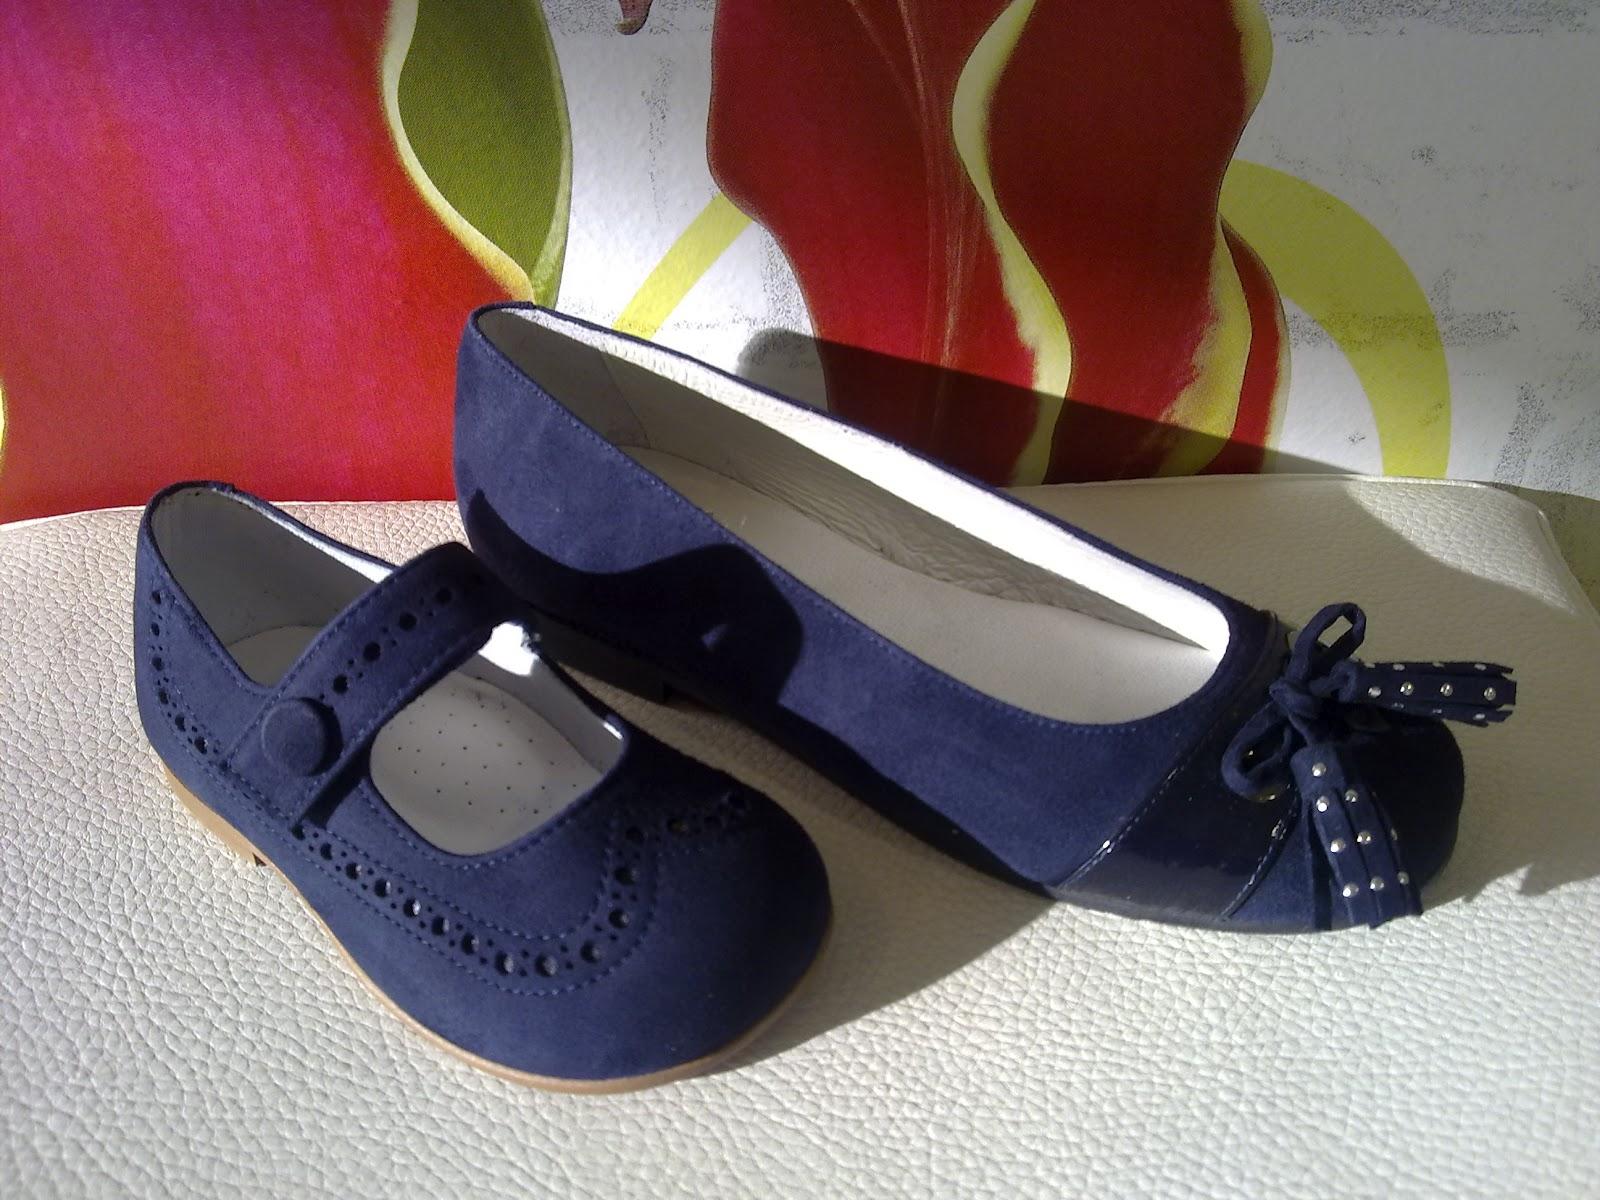 Moda Burlington para vestir tus pies cálidamente - Varela